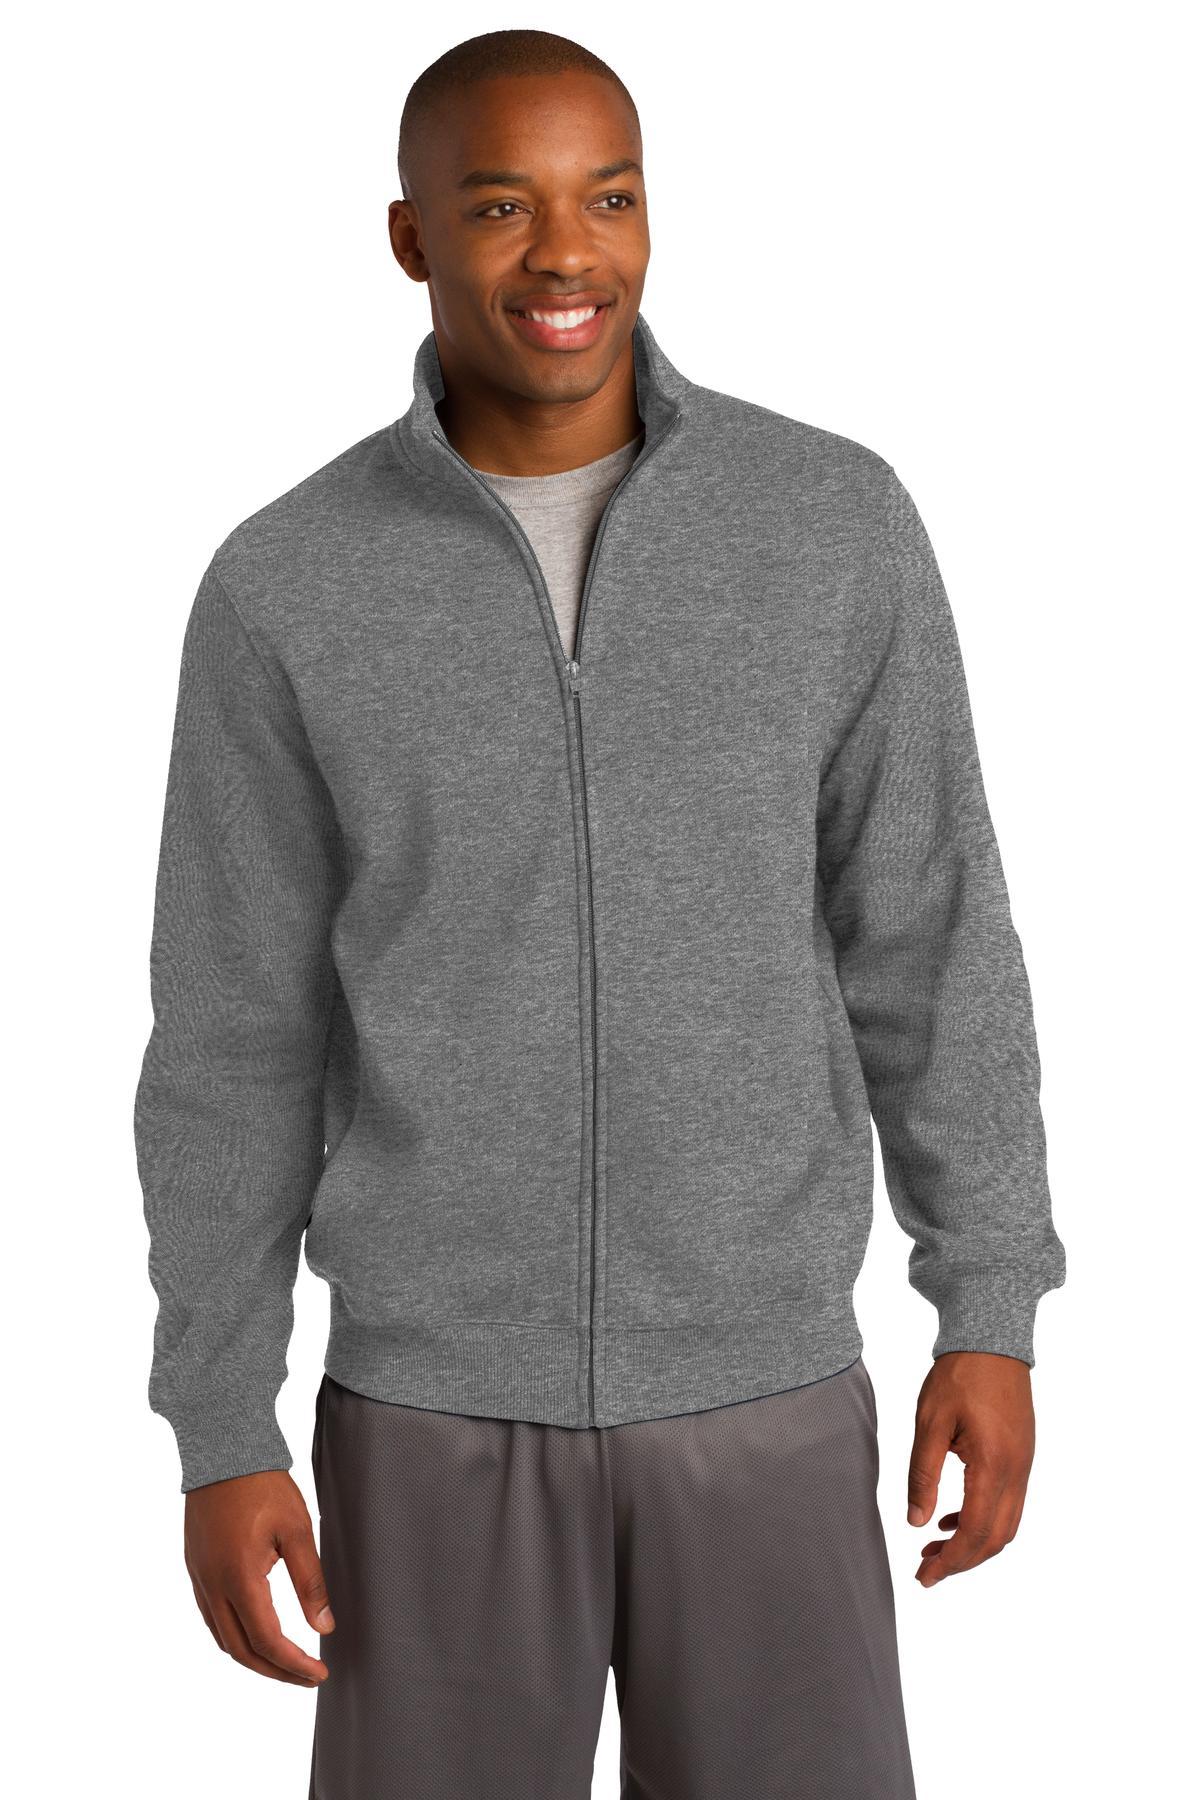 Sweatshirts-Fleece-Full-Zip-4